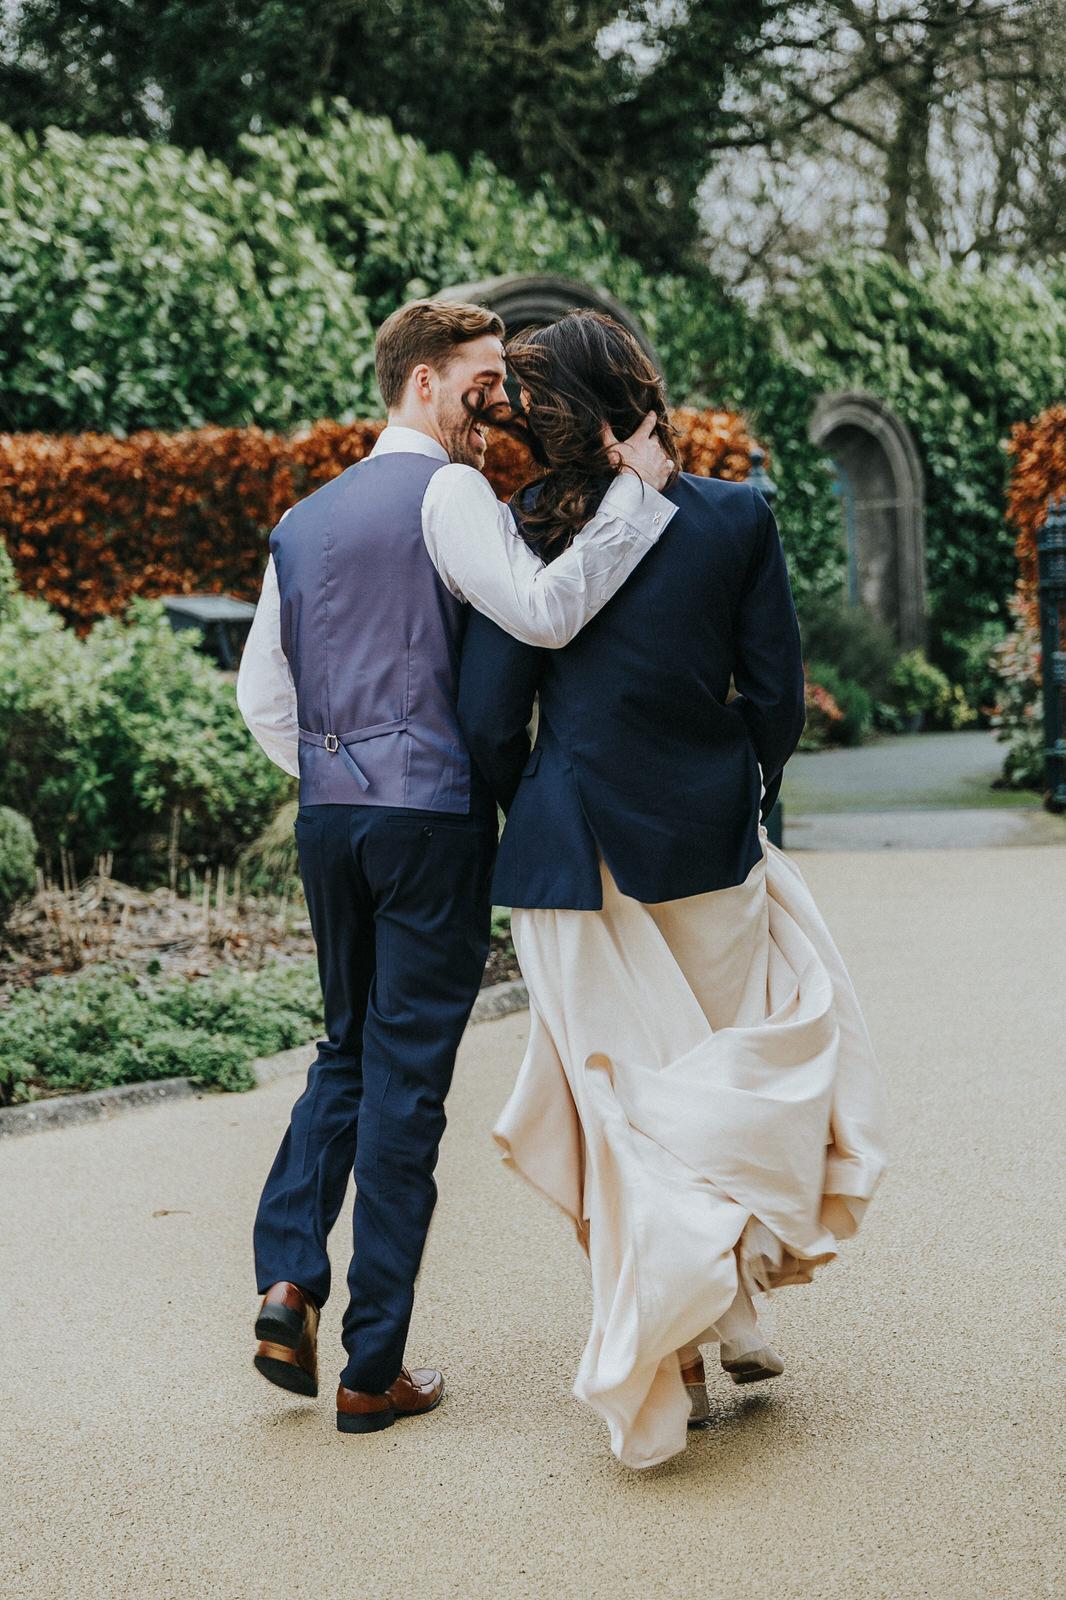 Roger_Kenny_wedding_photographer_454.jpg